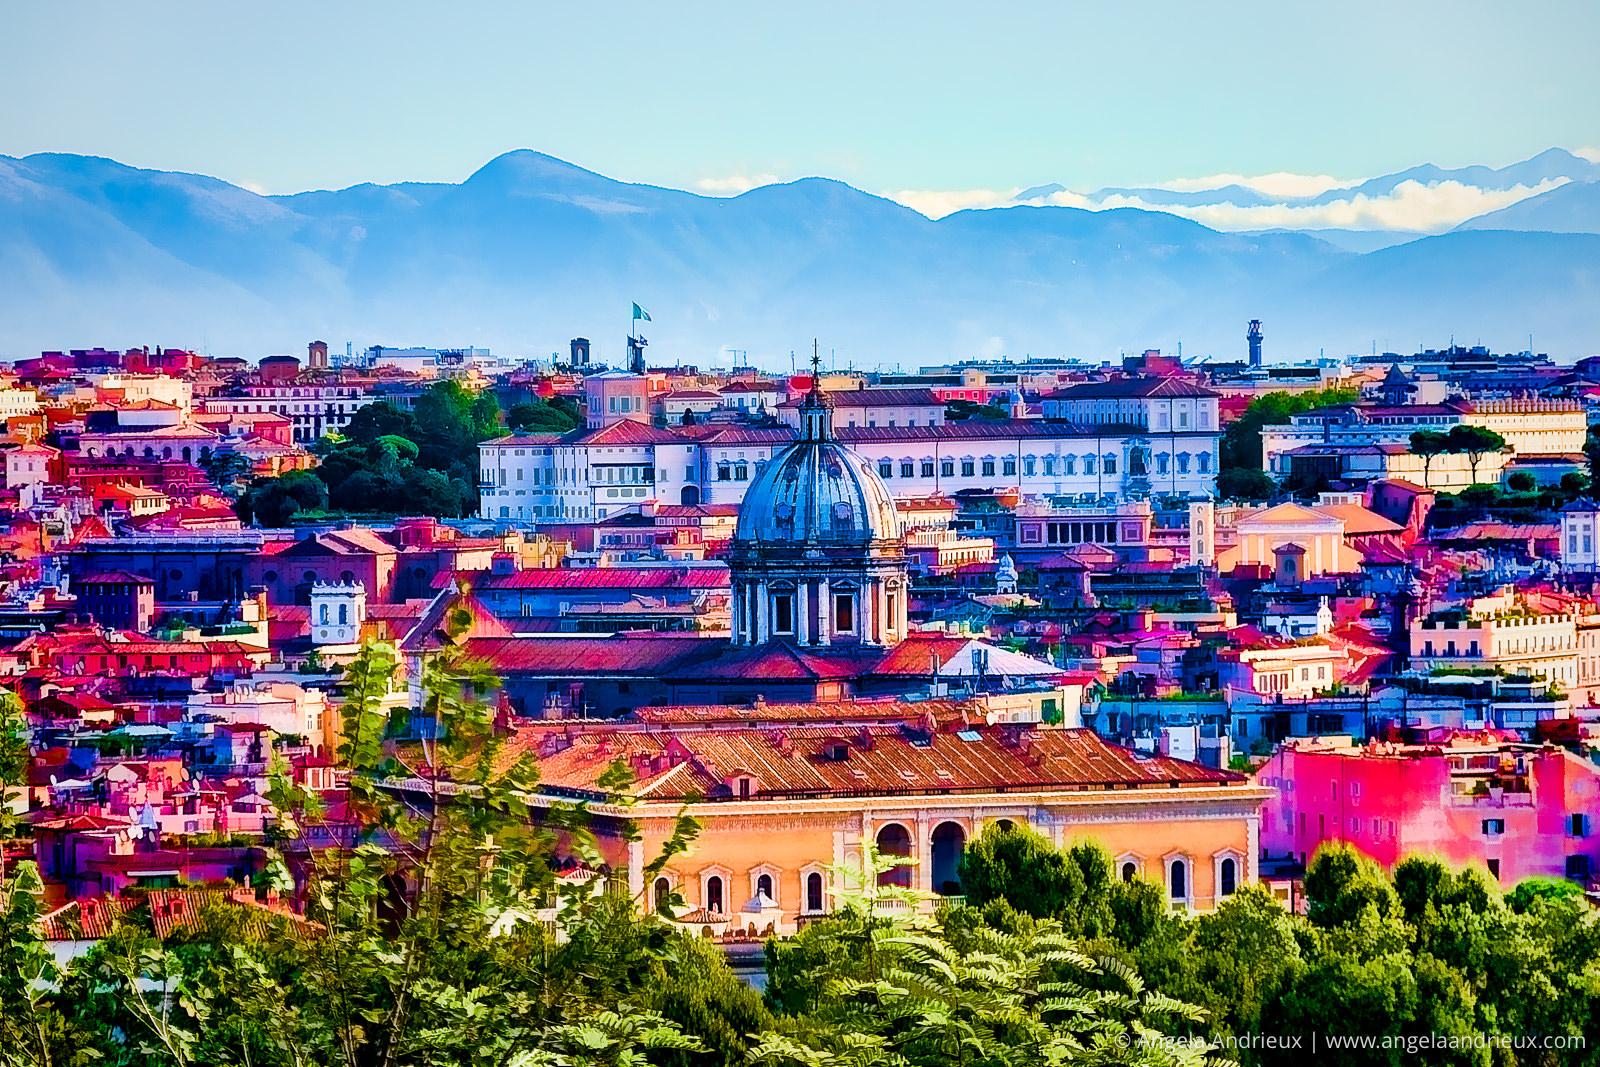 Bright Color Interpretation of Rome, Italy | Made With Topaz Plugins